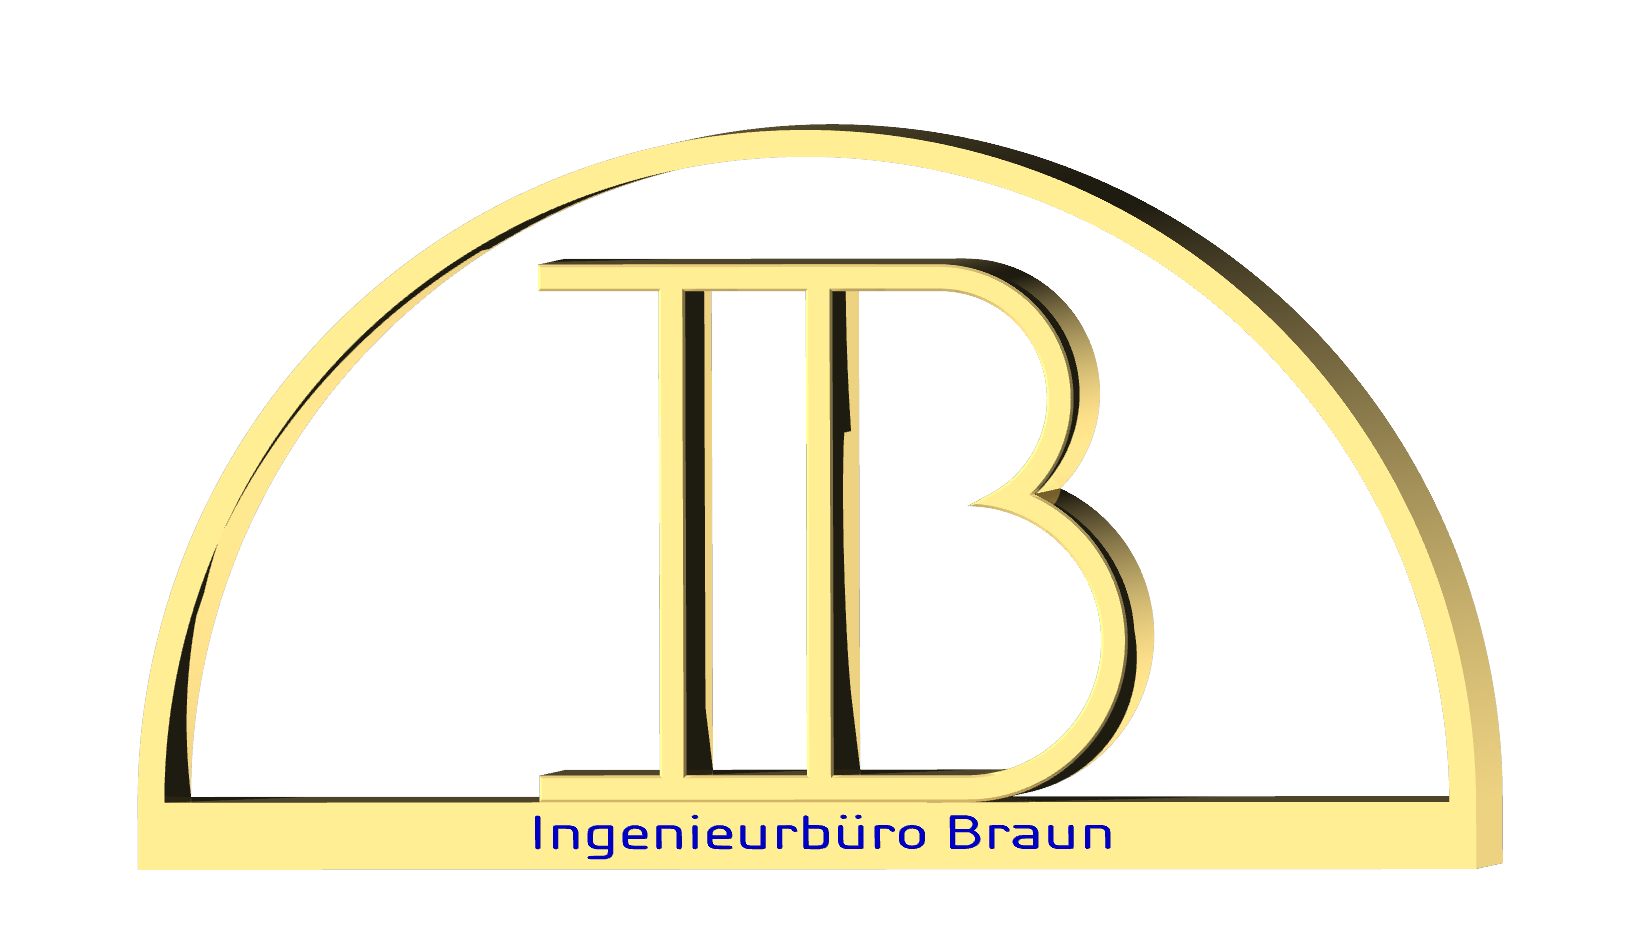 Ingenieurbüro Braun